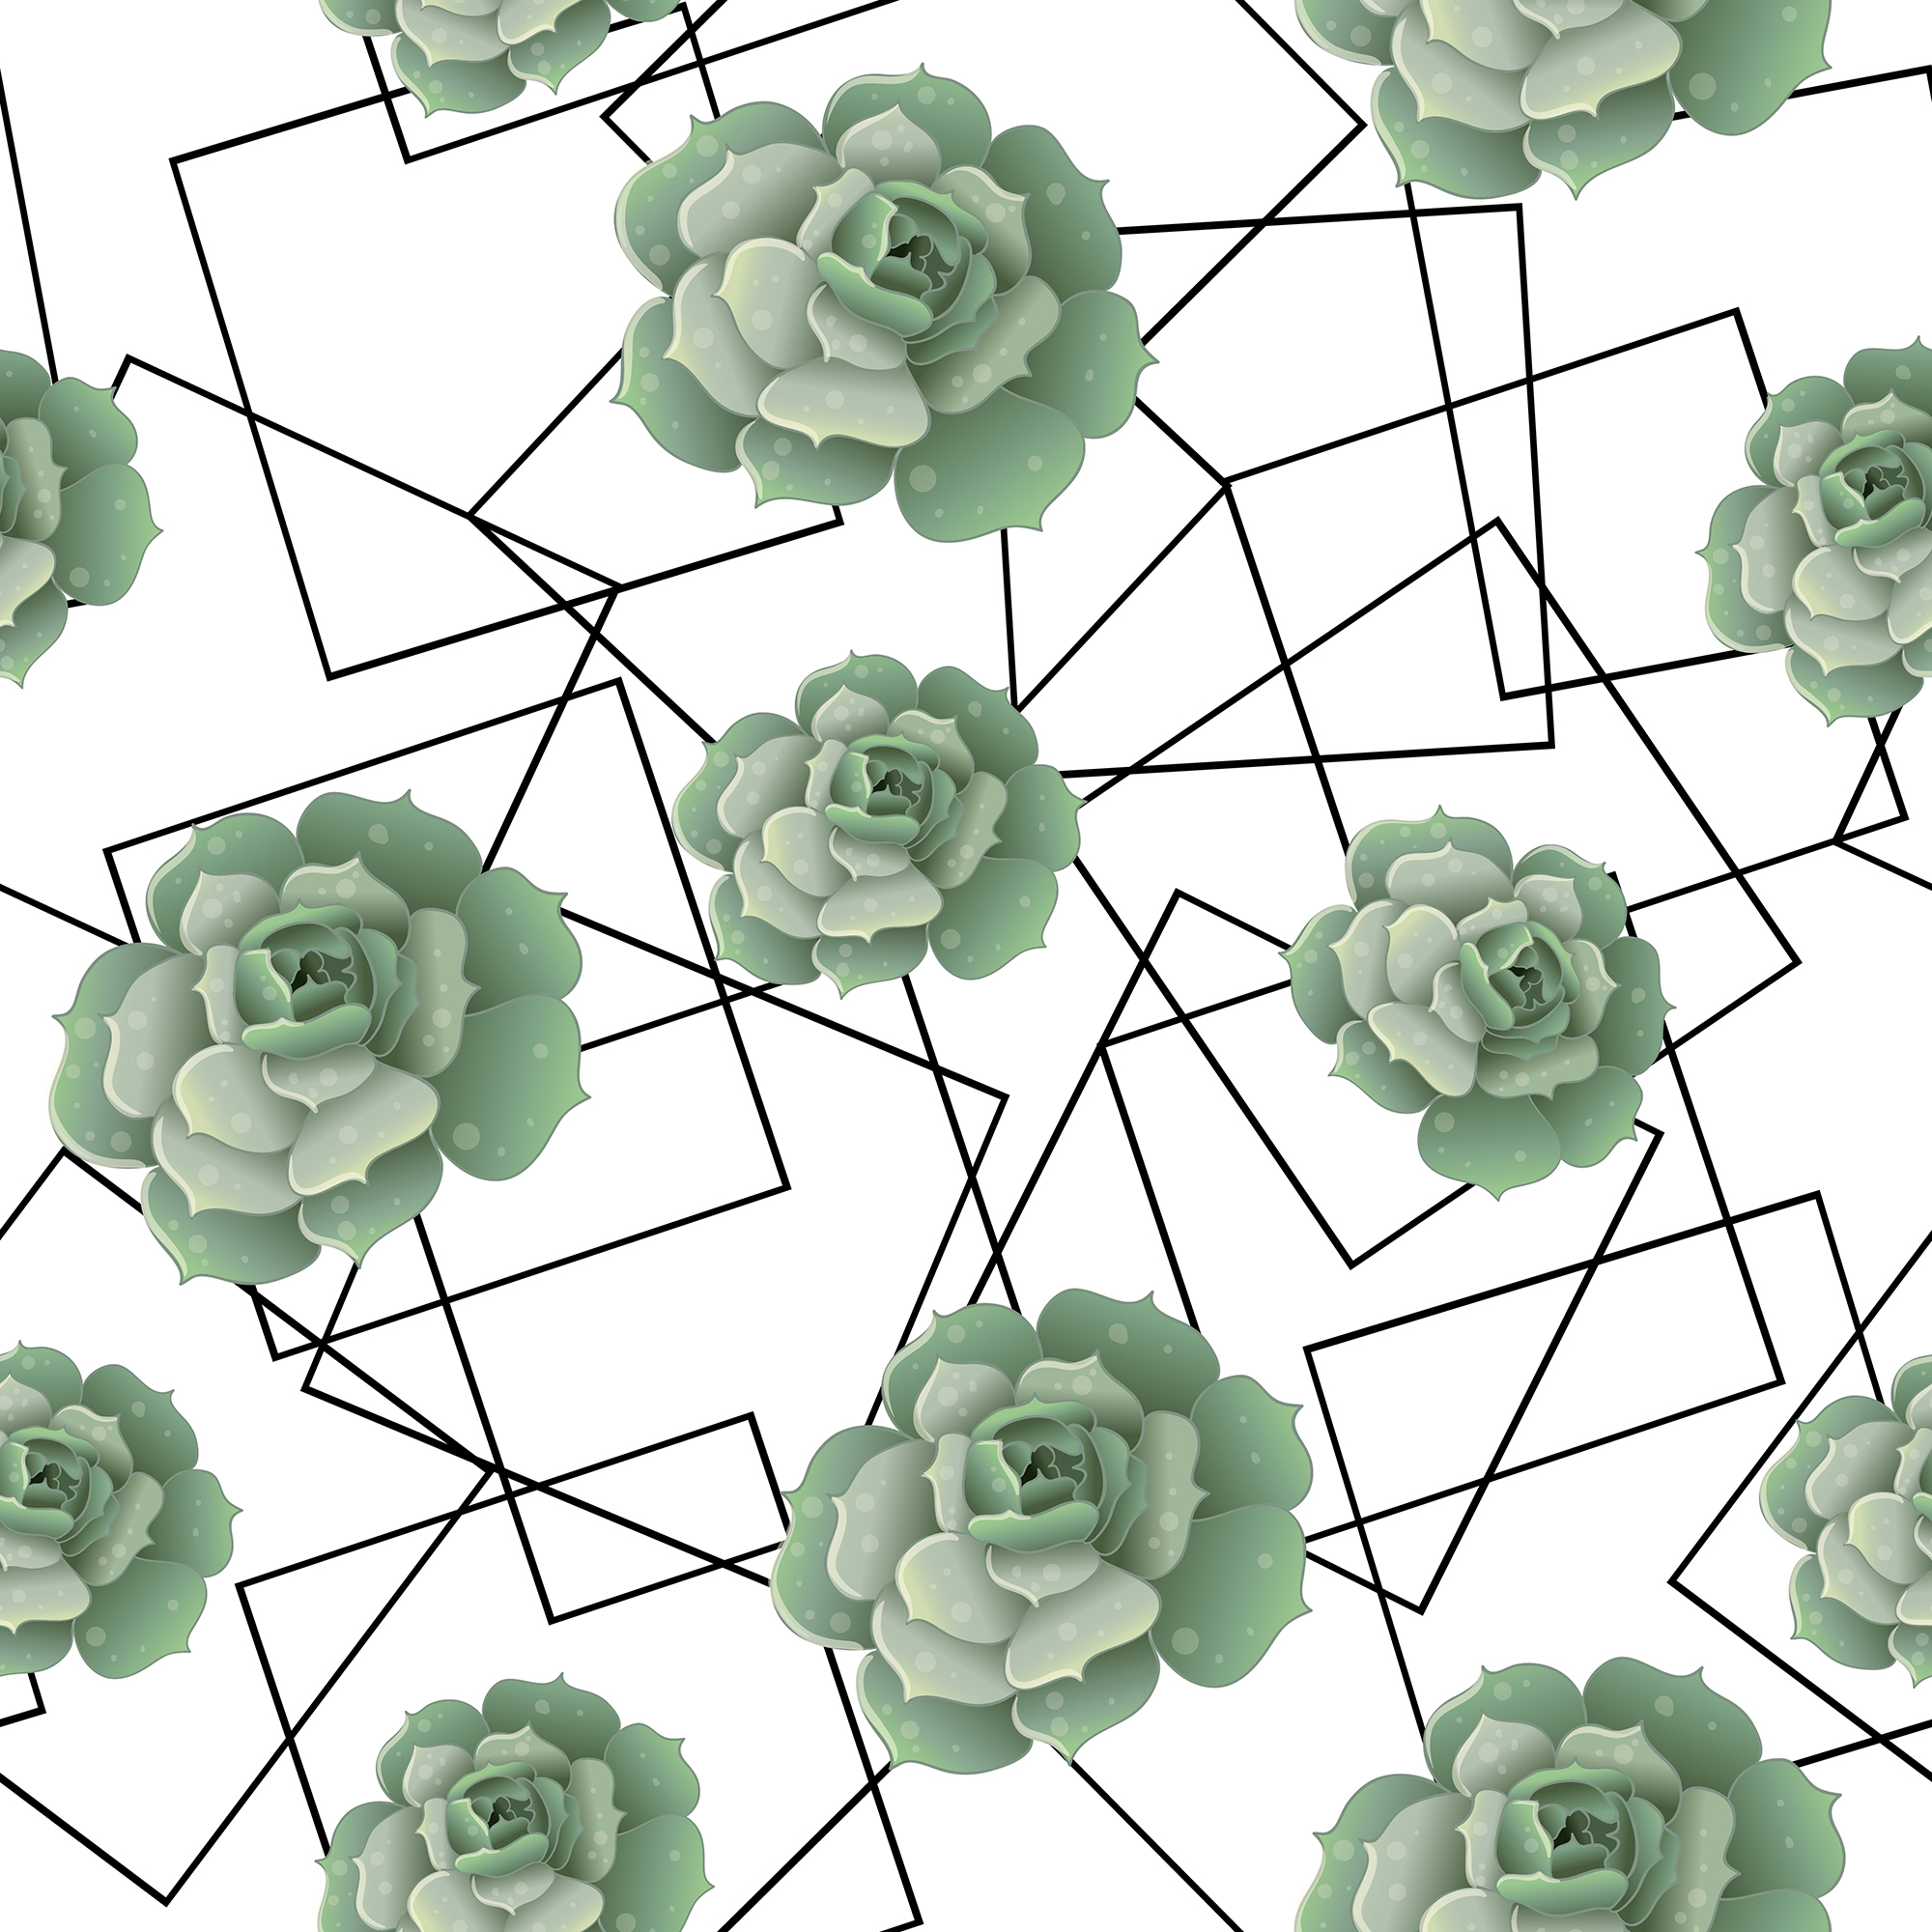 Wedding greenery invitation, patterns and isolated elements example image 7